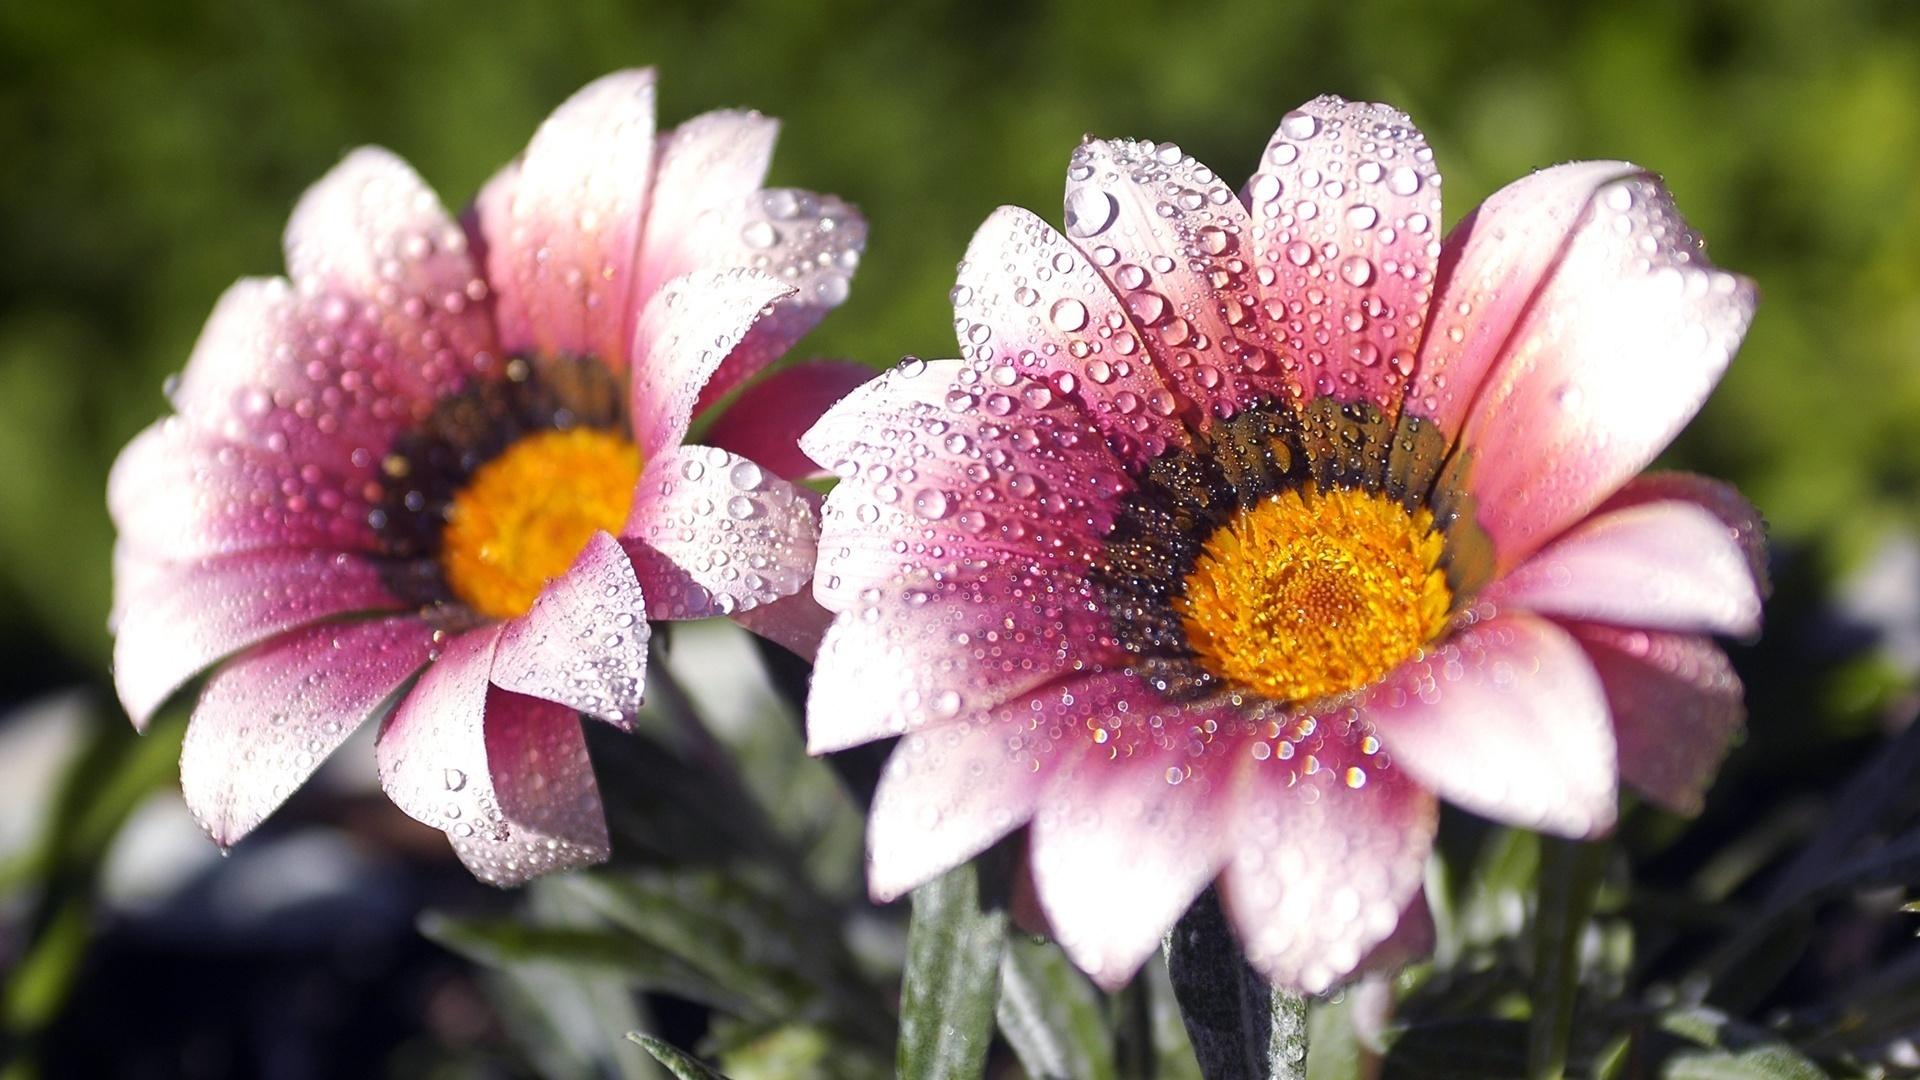 Blooming_Flowers_HDTV_Wallpapers_laba.ws